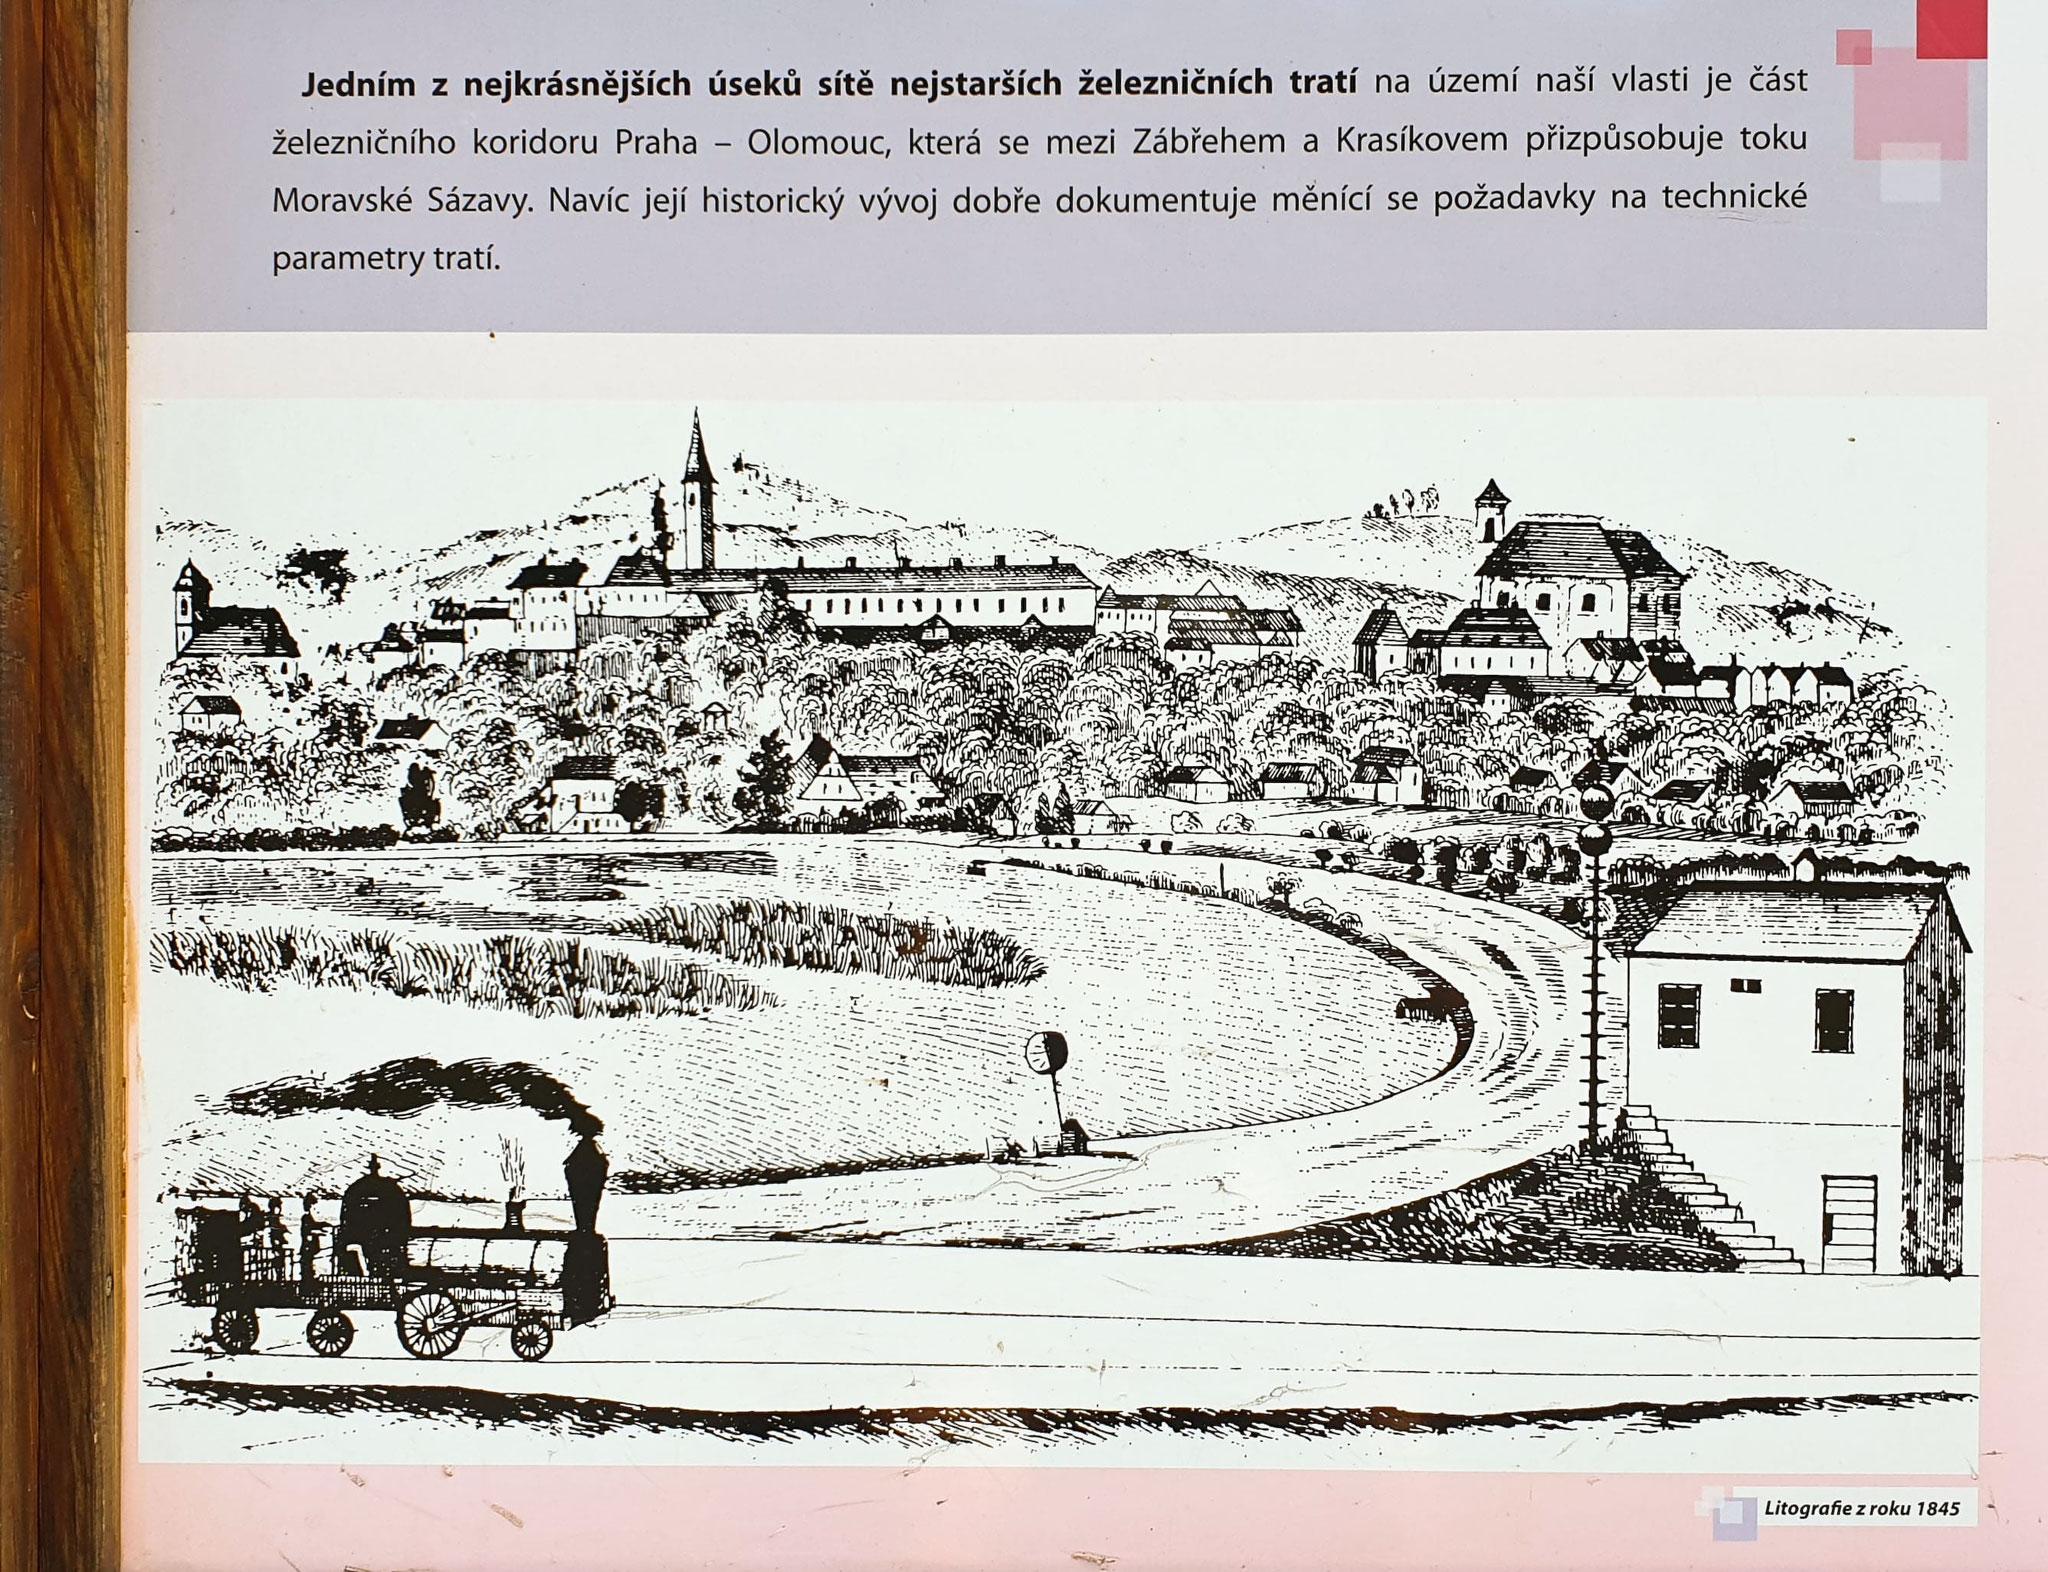 Bahntrasse Hostejn - Lupené (Zabreh), von früher